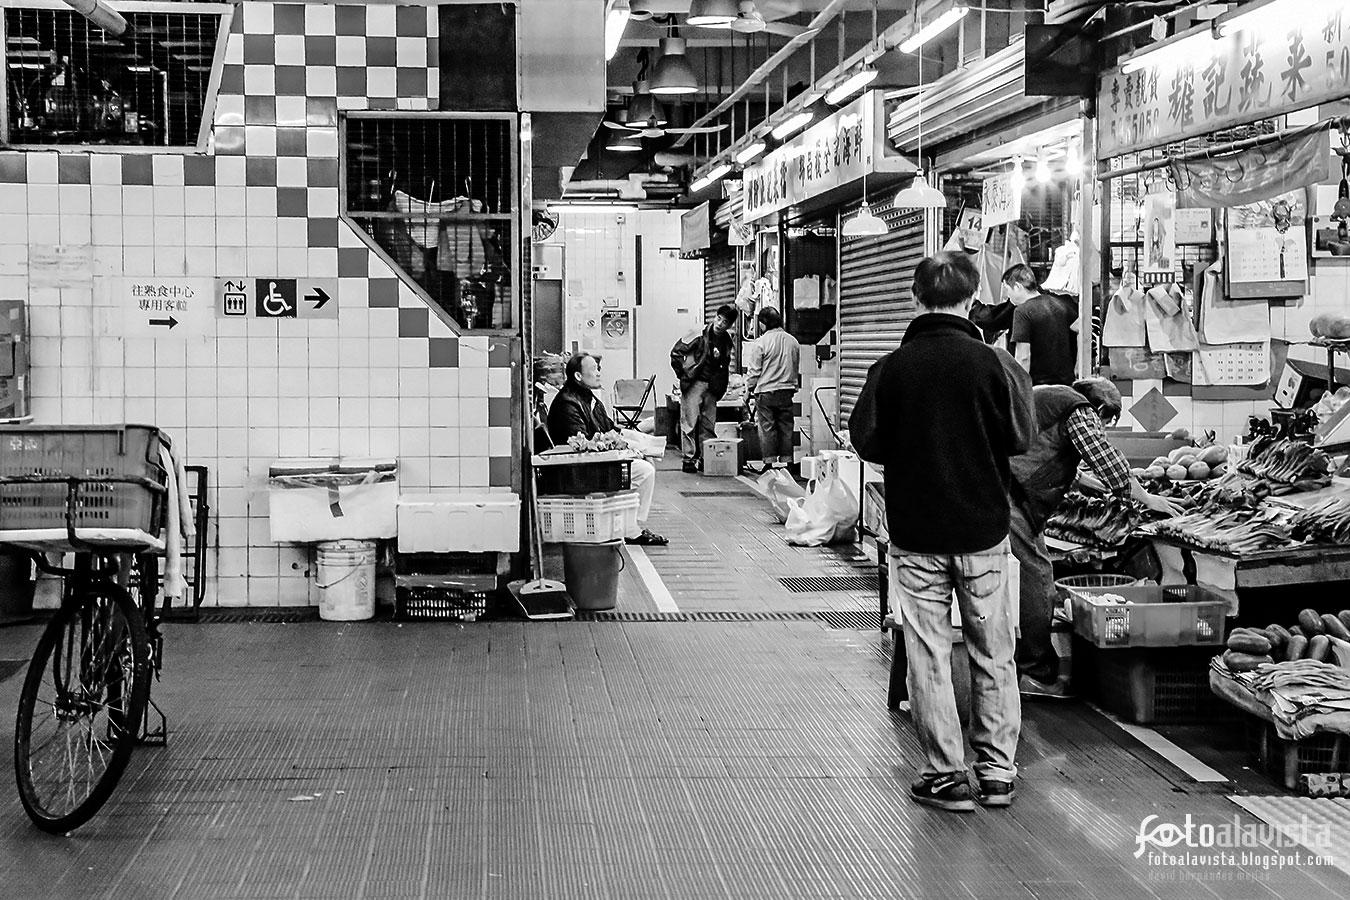 Hong Kong Market - Fotografía artística